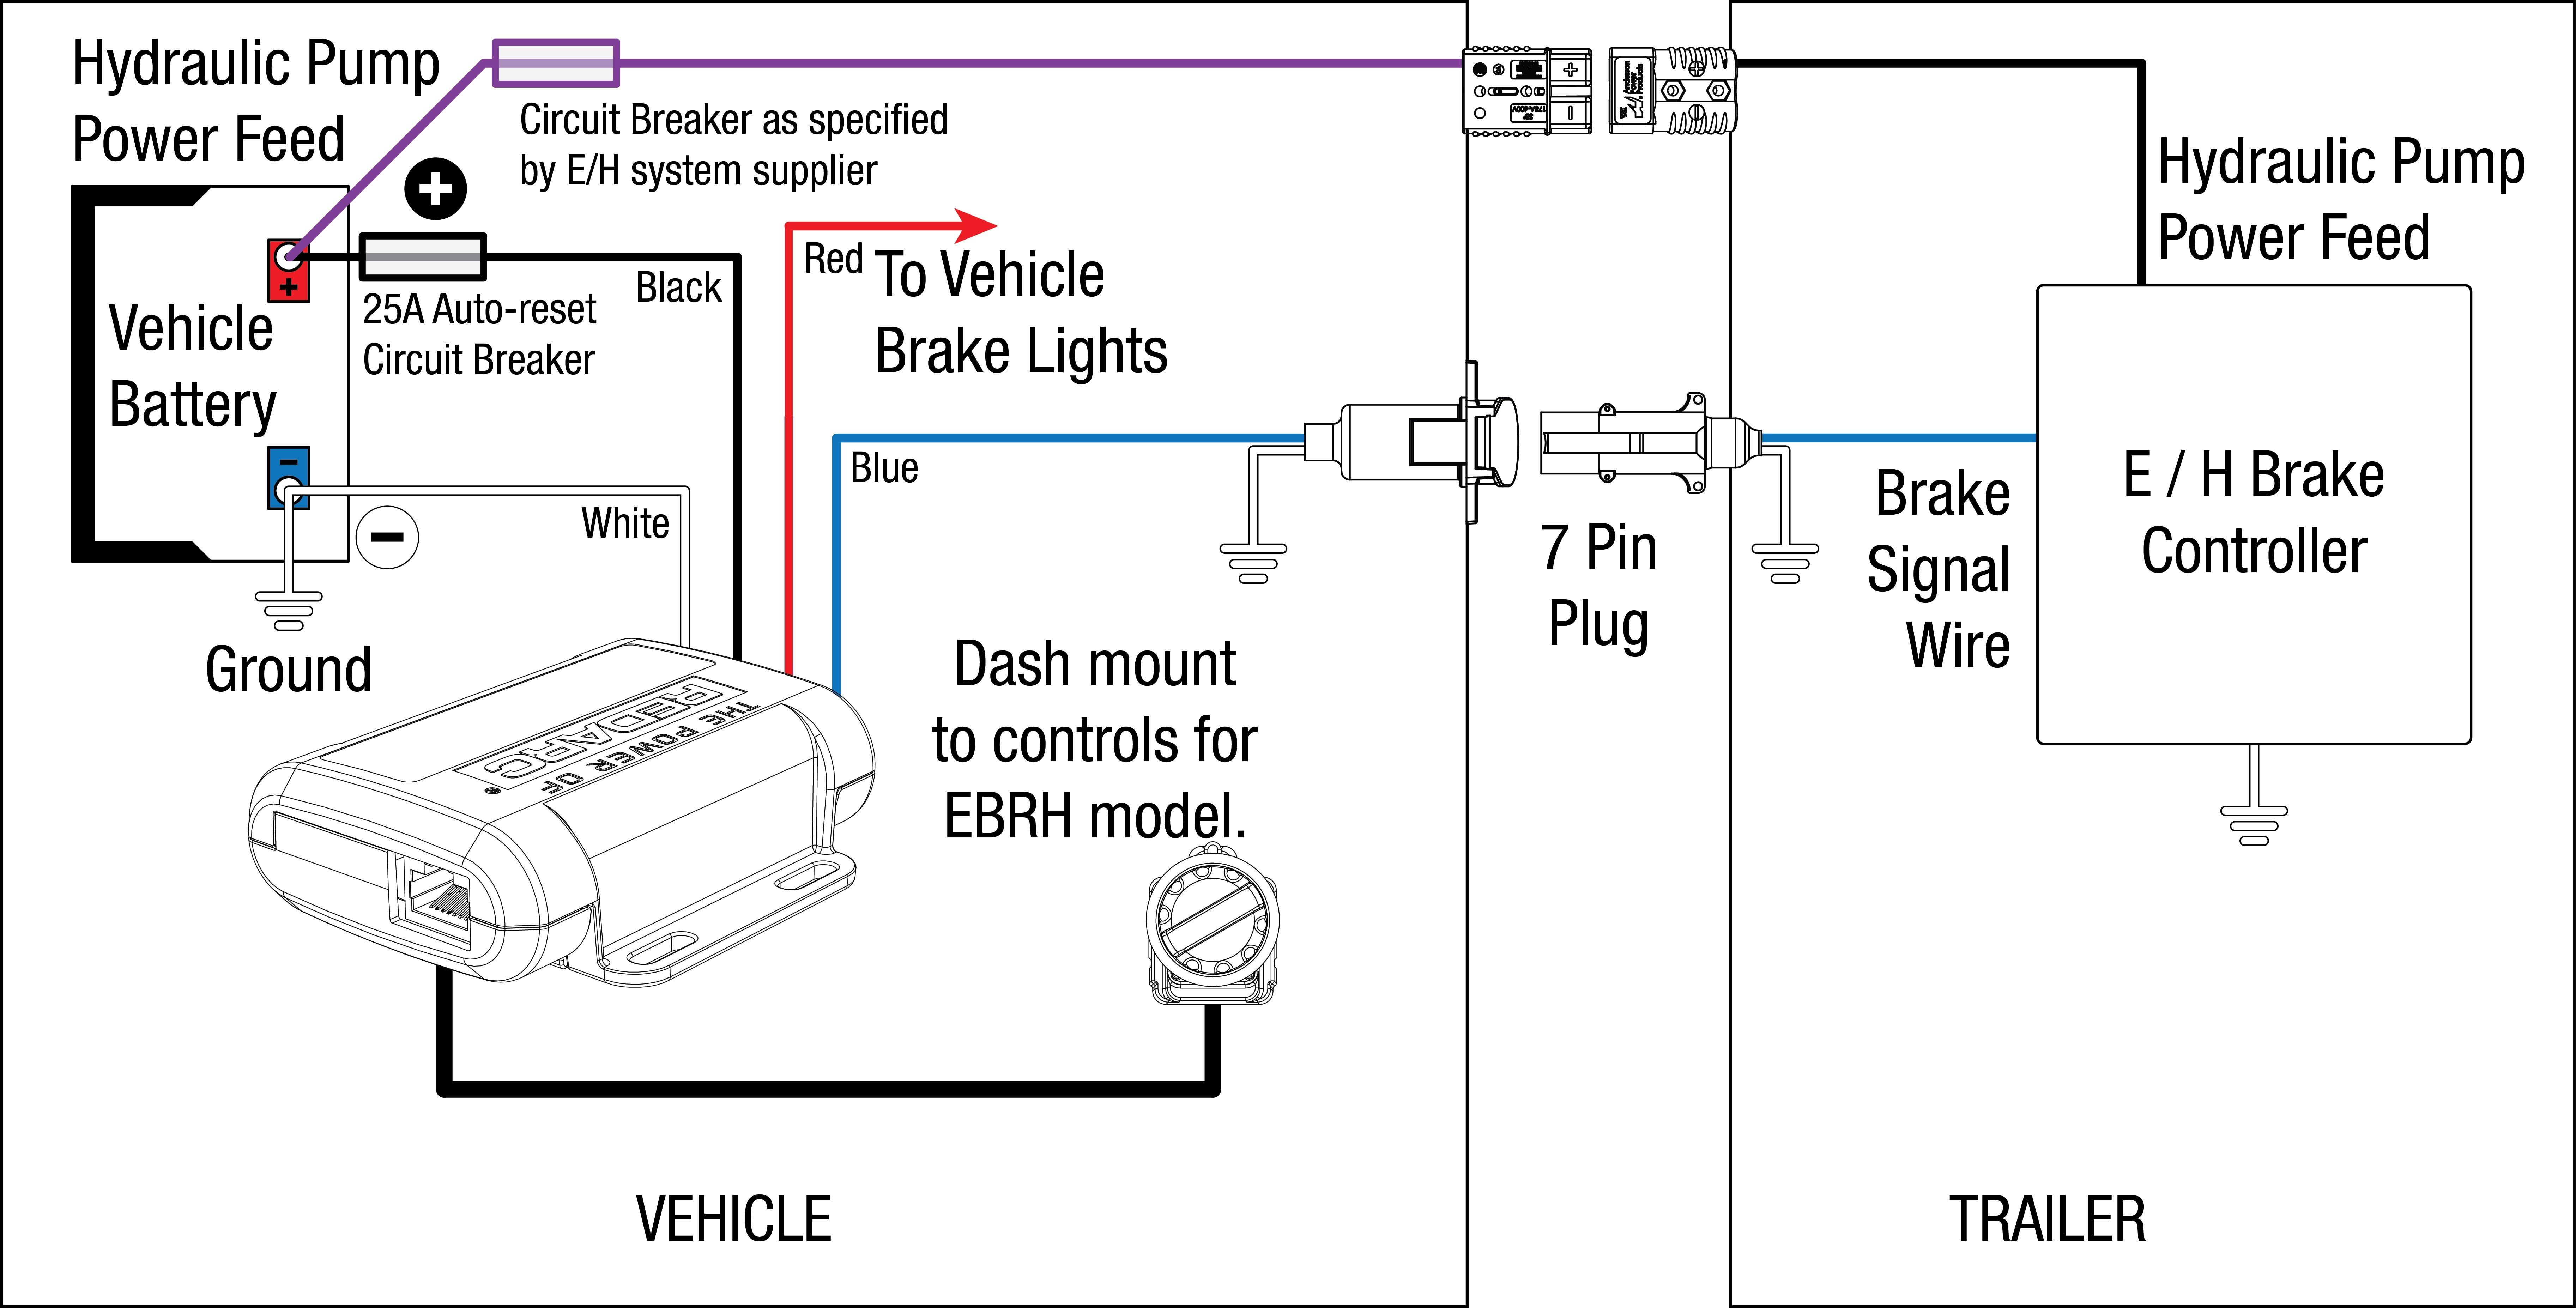 Pole Mounted Controller Wiring Diagram Wiring Diagram Luxury Travel Trailer Battery Wiring Diagram Diagram Diagram Evaporator Wiring Diagram Pole Mounted